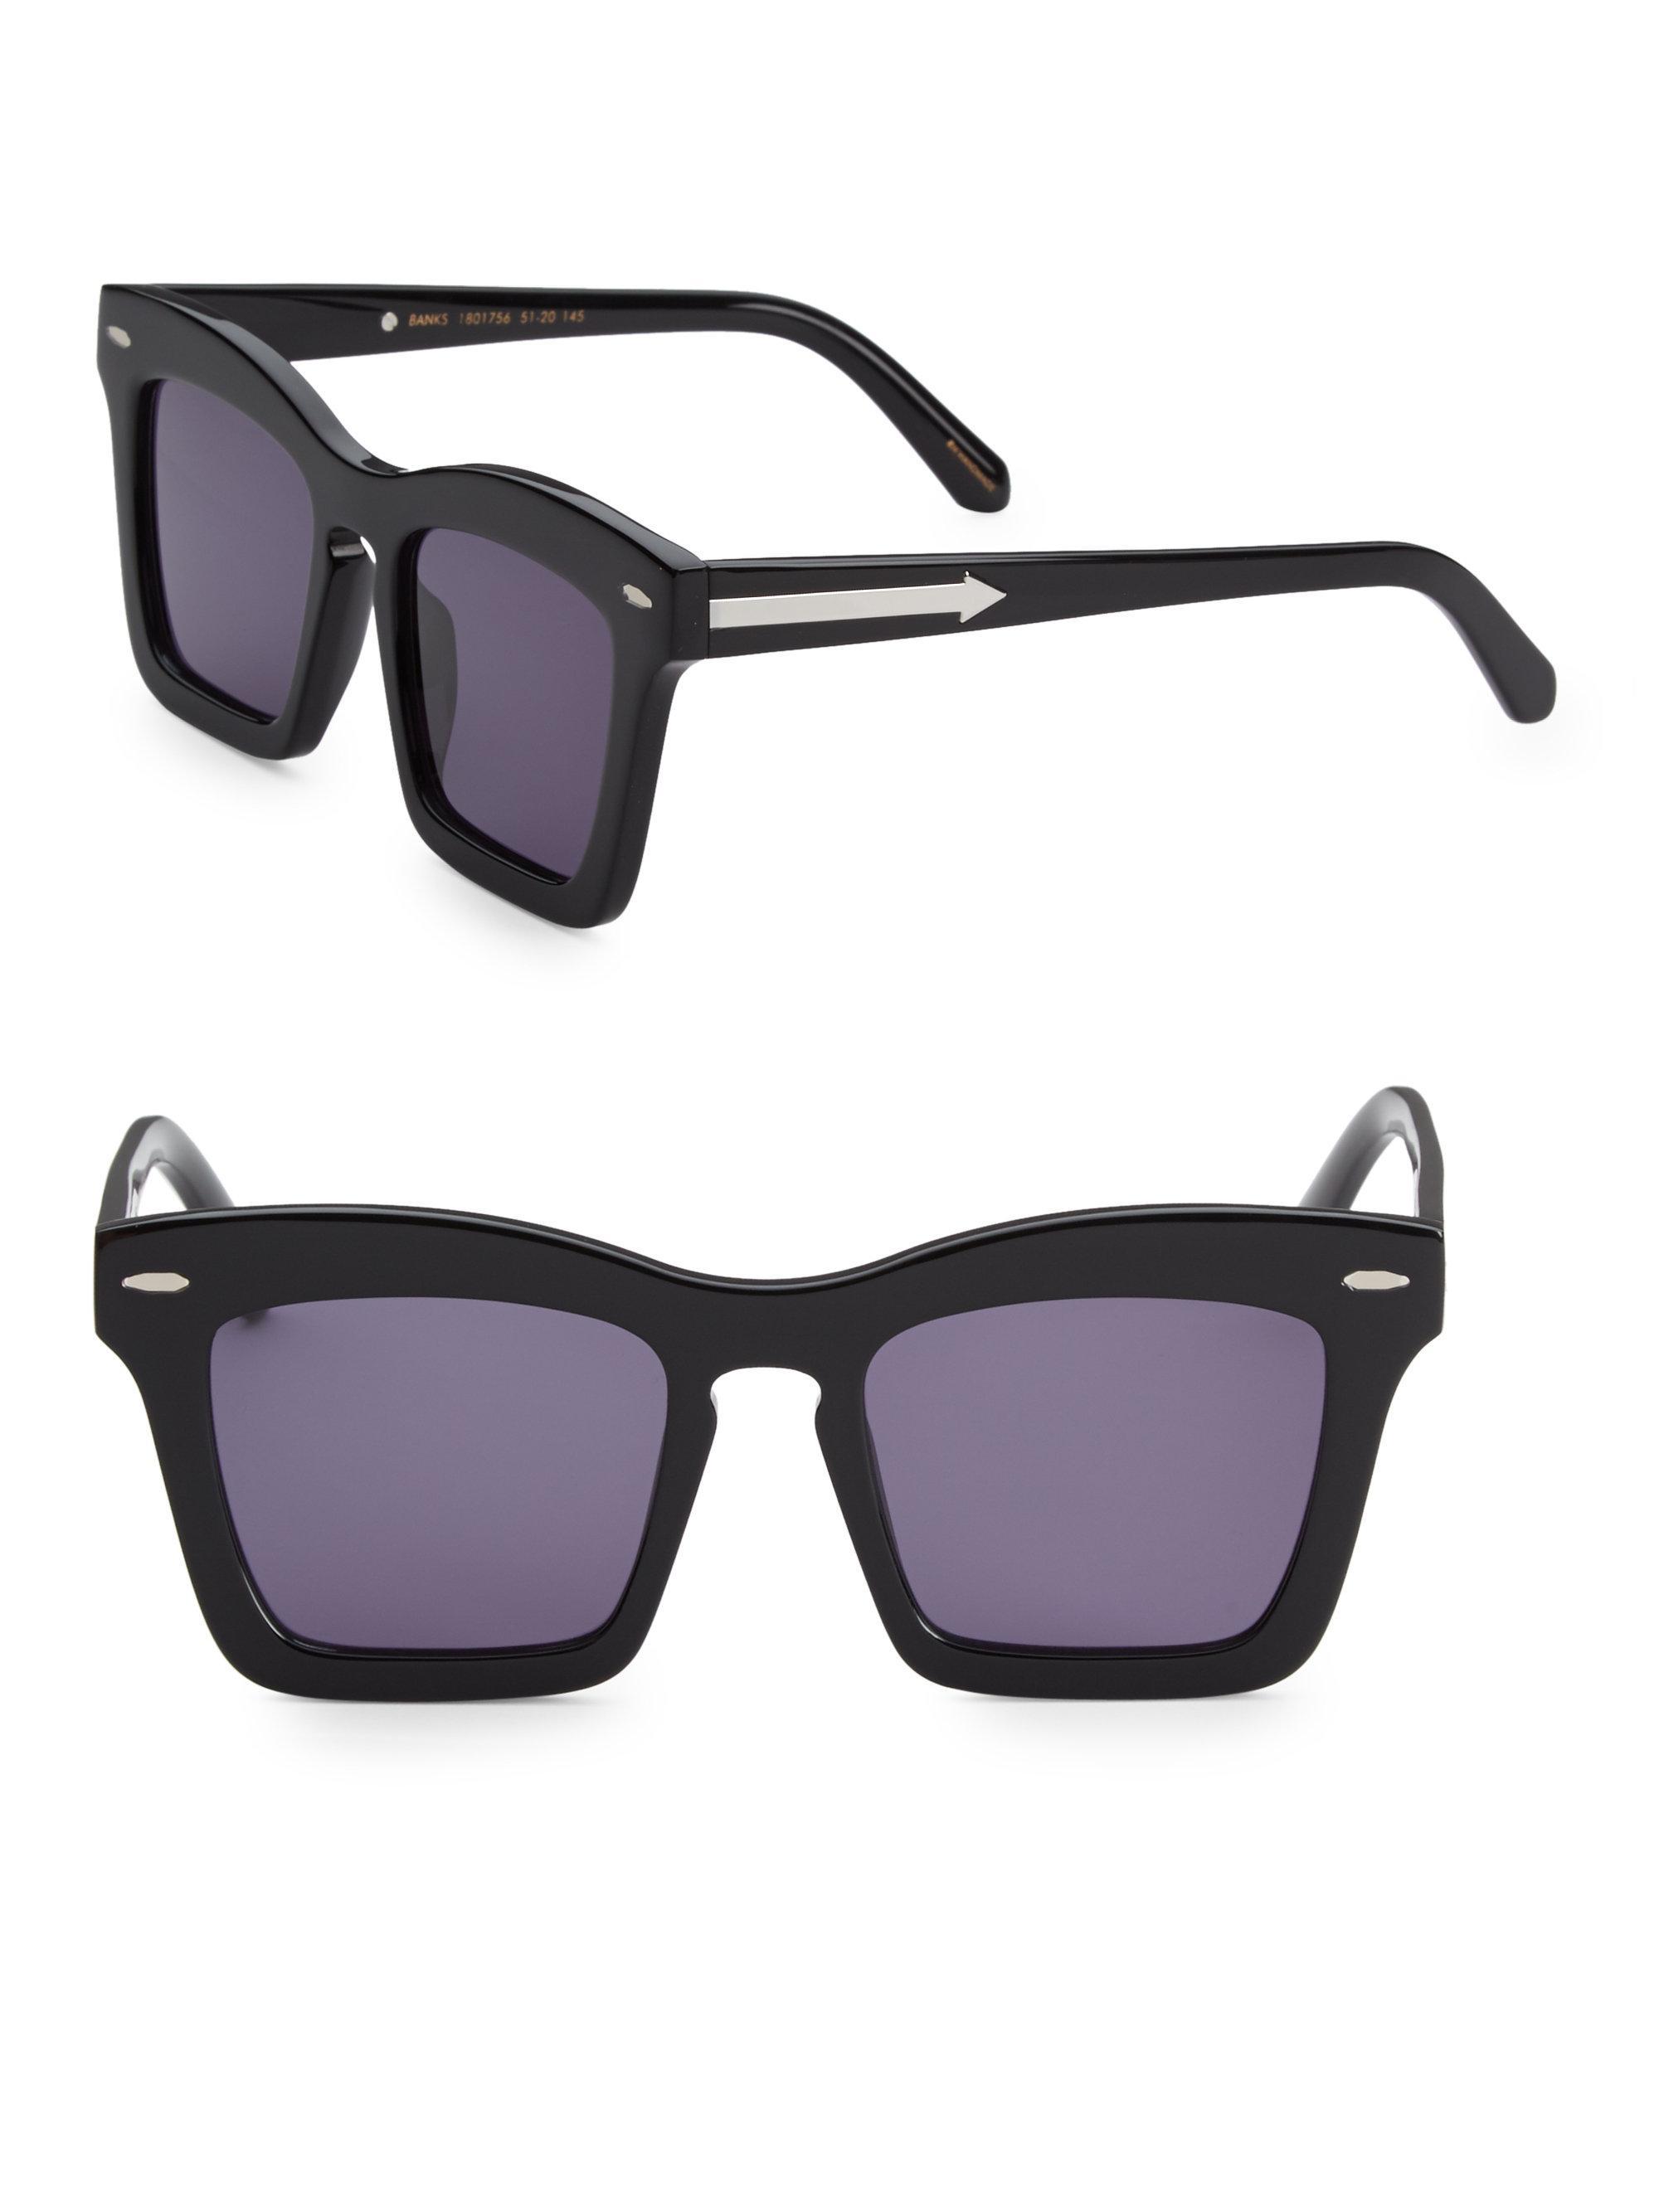 Banks Square-Frame Acetate Sunglasses Karen Walker yTiwS8yh